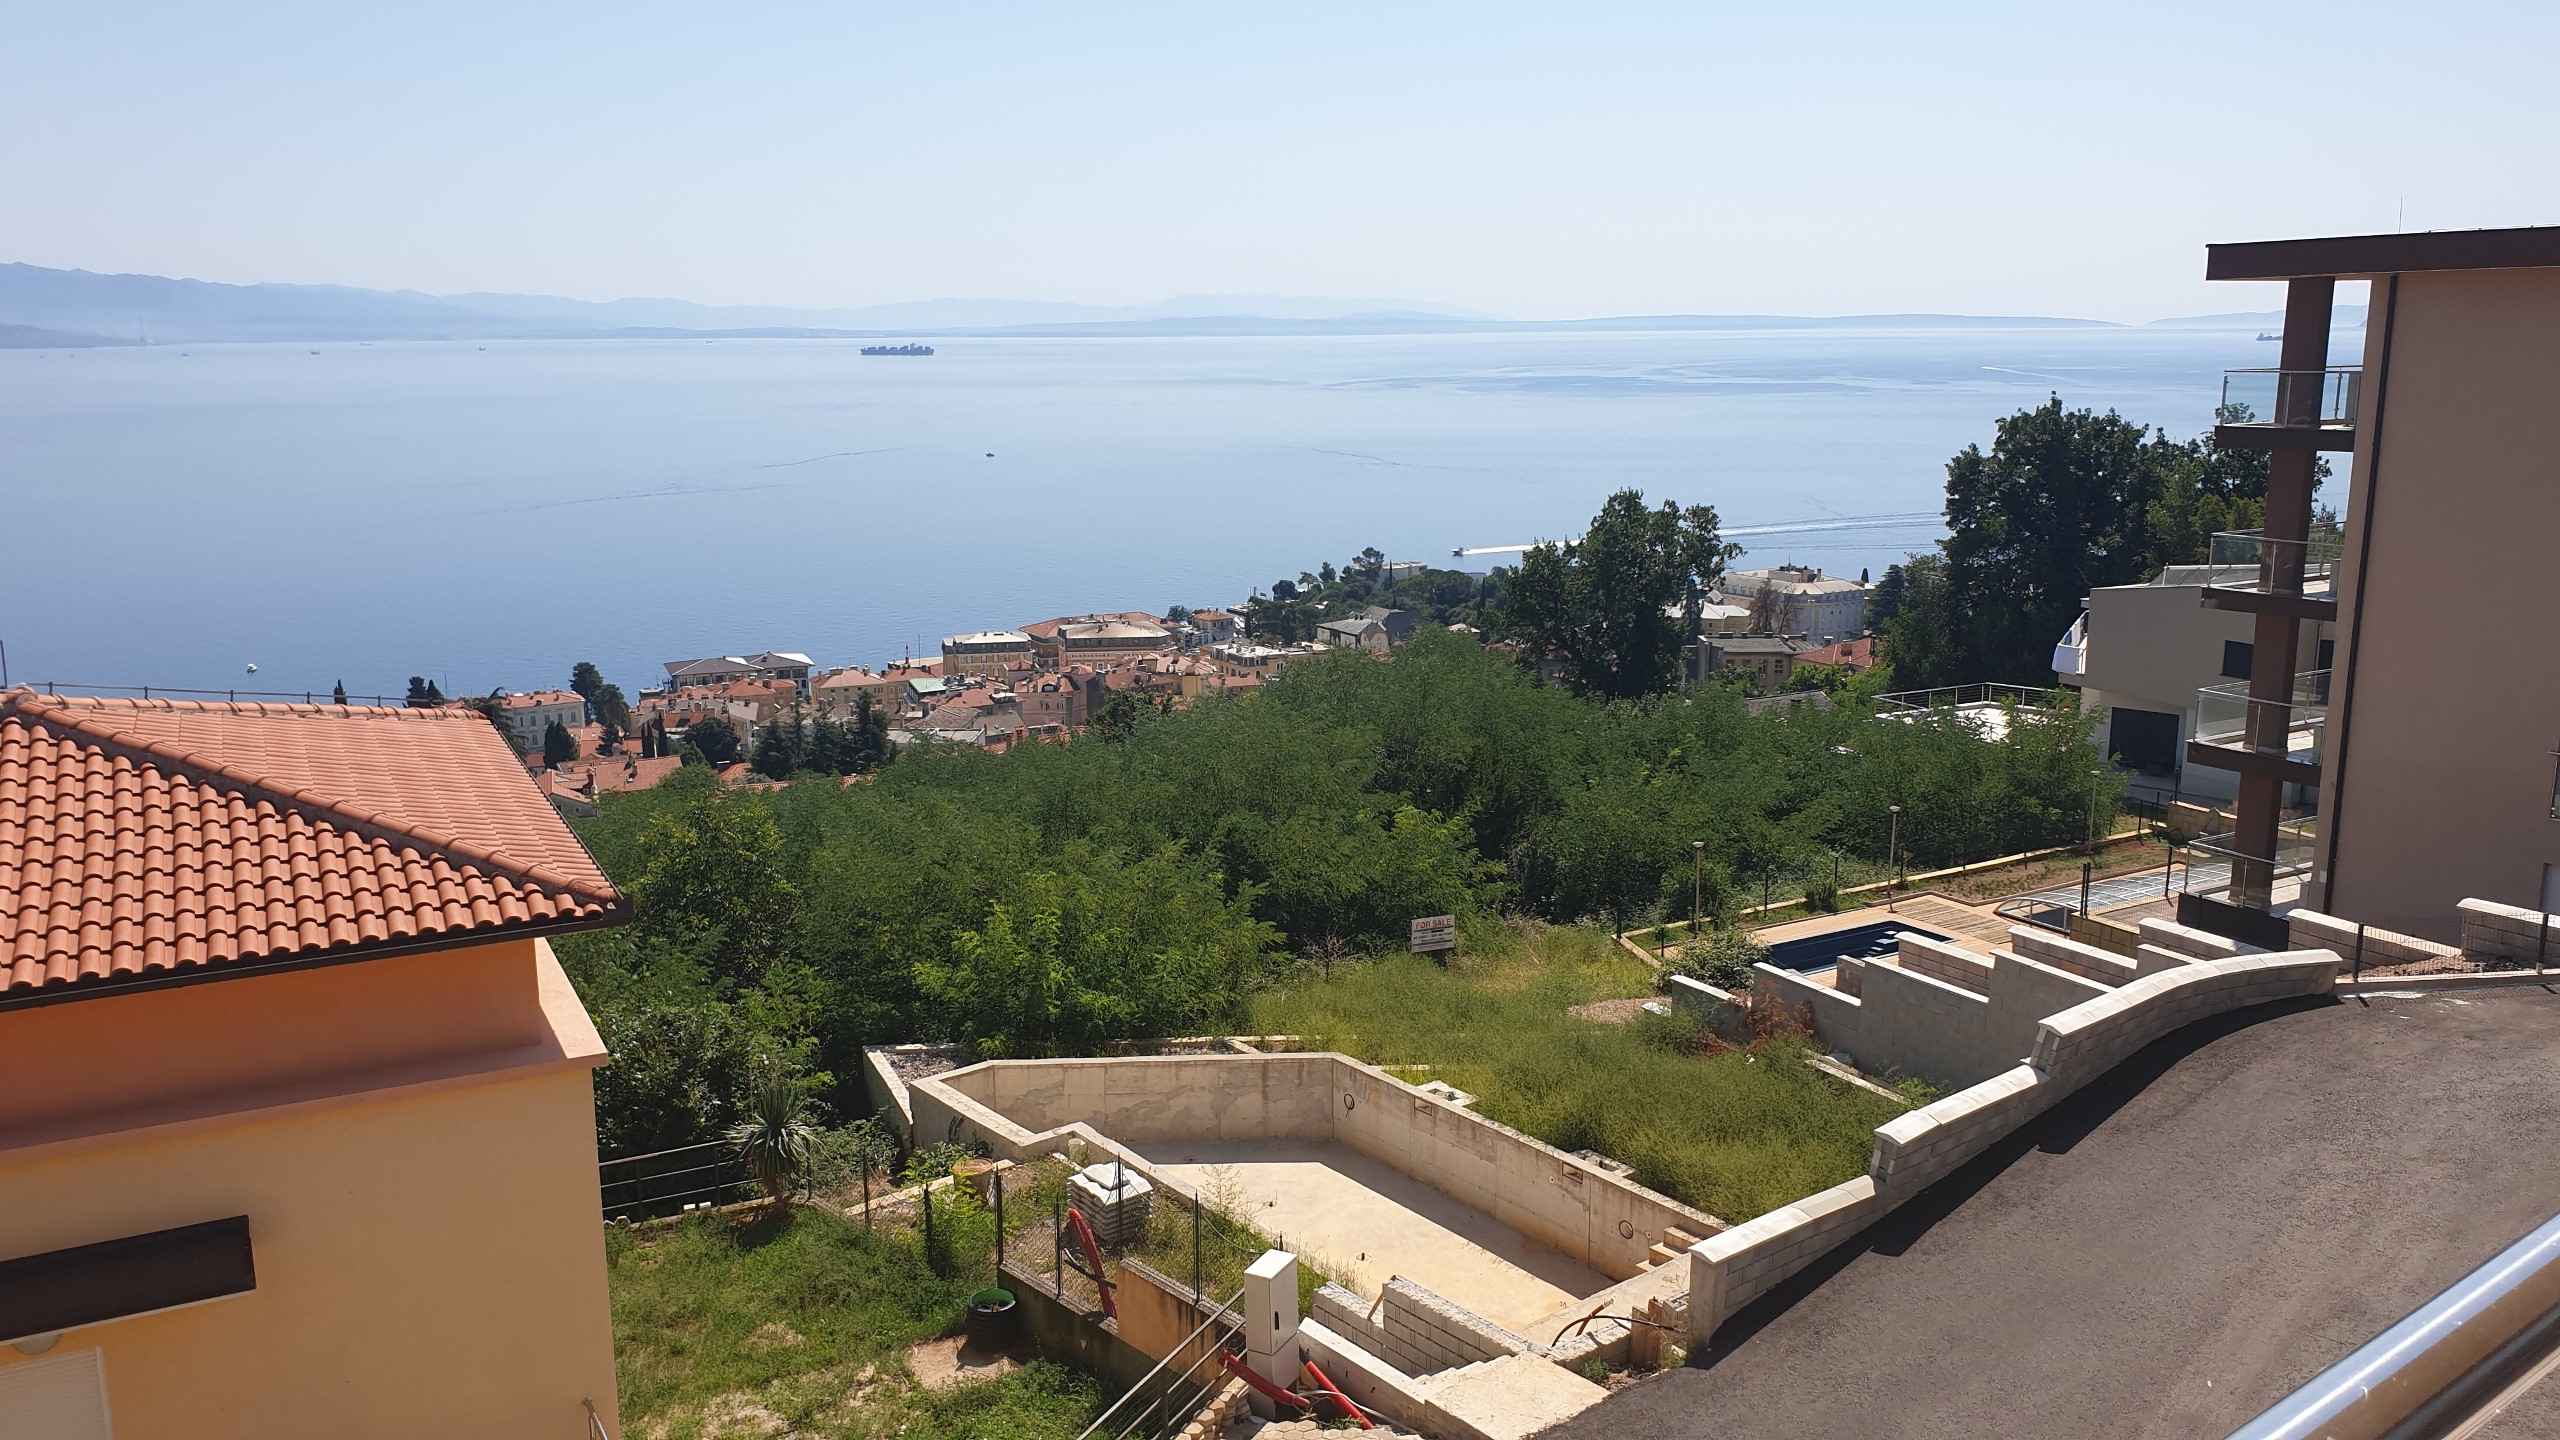 Luxury real estate Croatia Farkaš sells new luxury apartments in Opatija